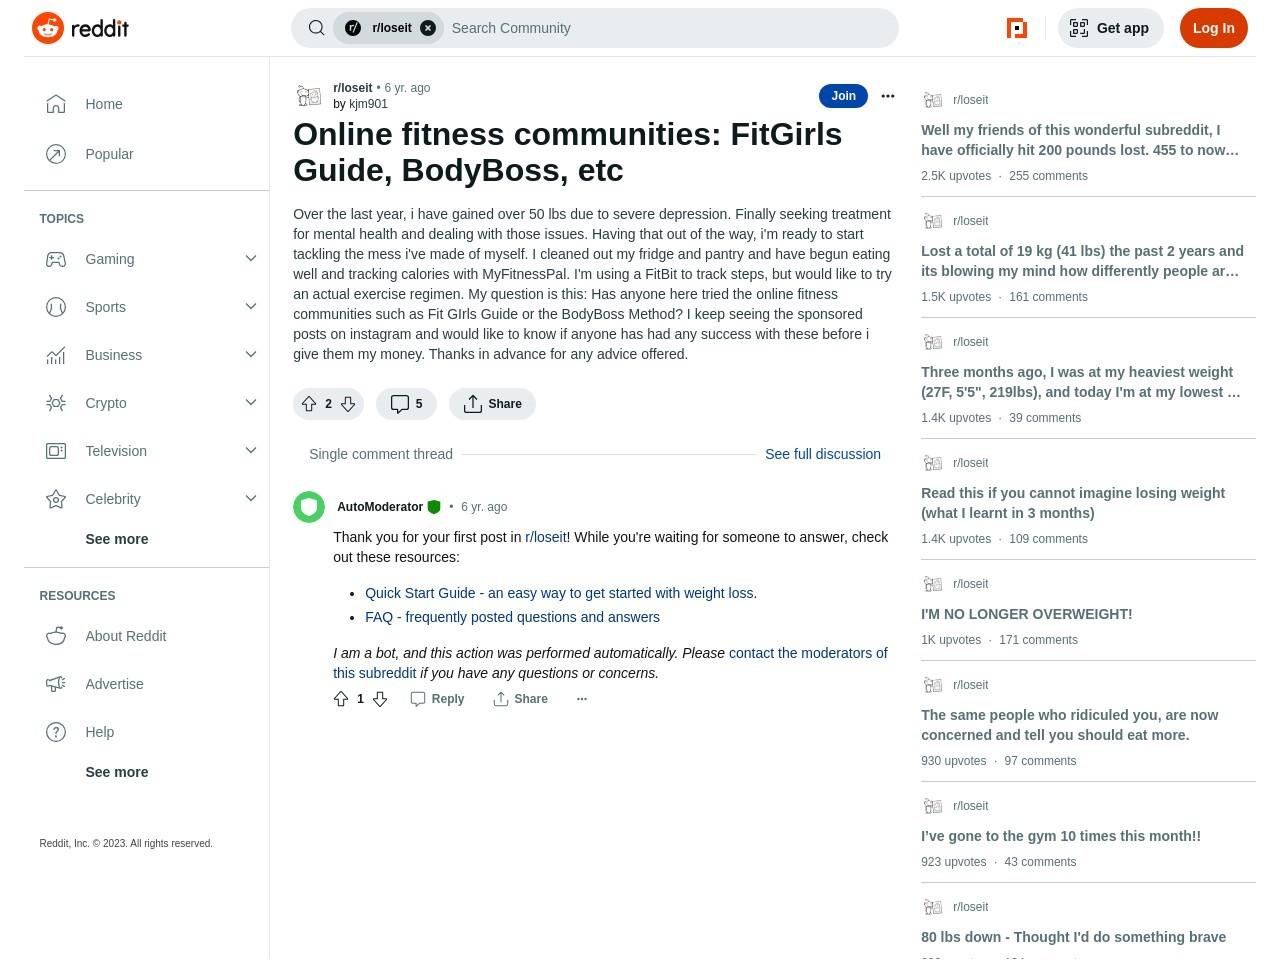 Online fitness communities: FitGirls Information, BodyBoss, etc